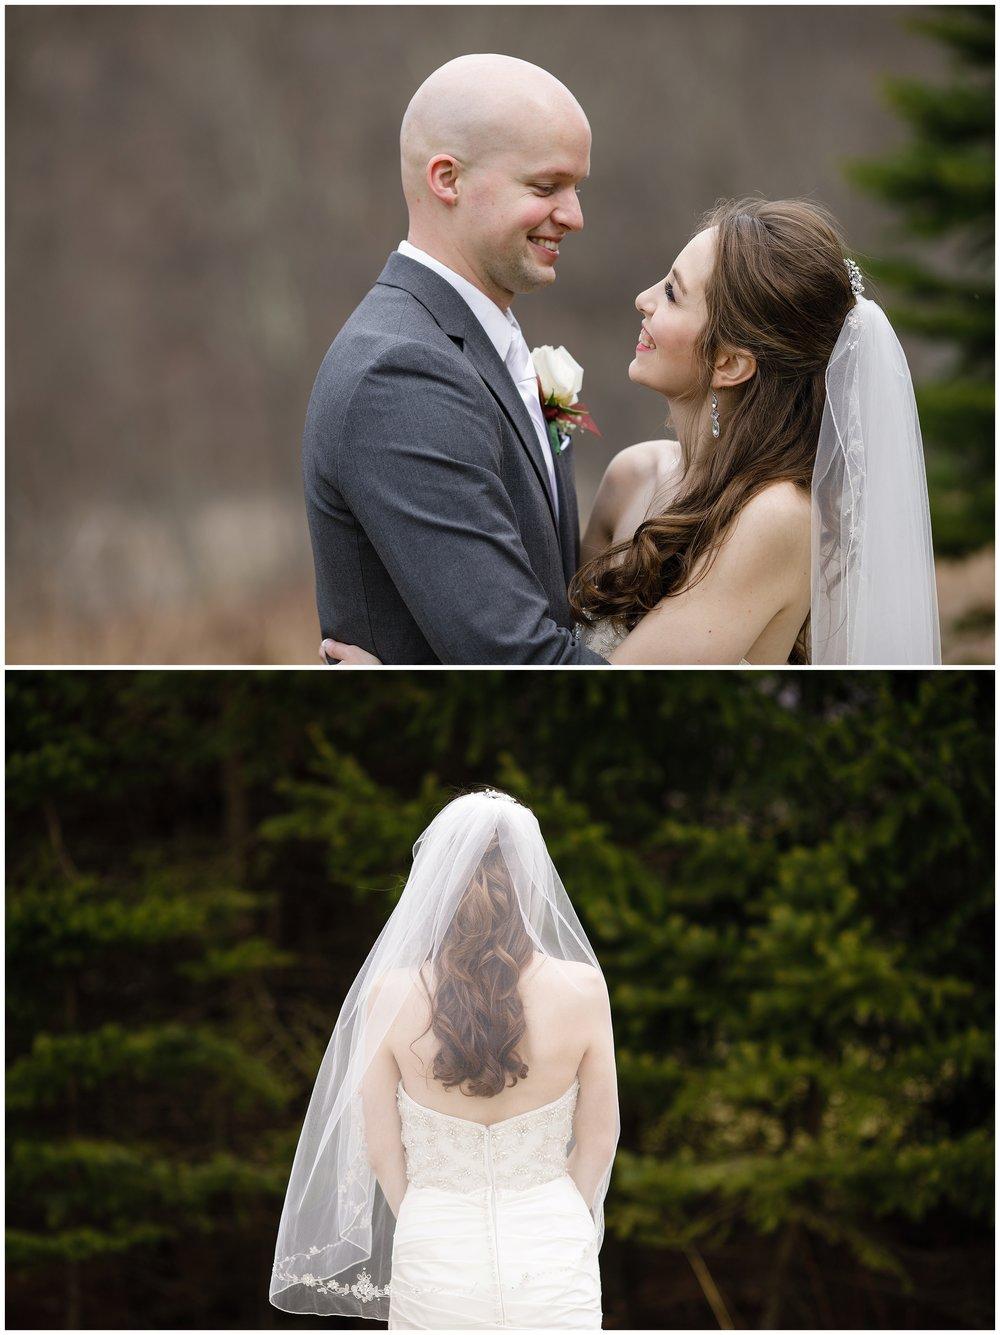 Allison-Park-Church-Wedding_0018.jpg